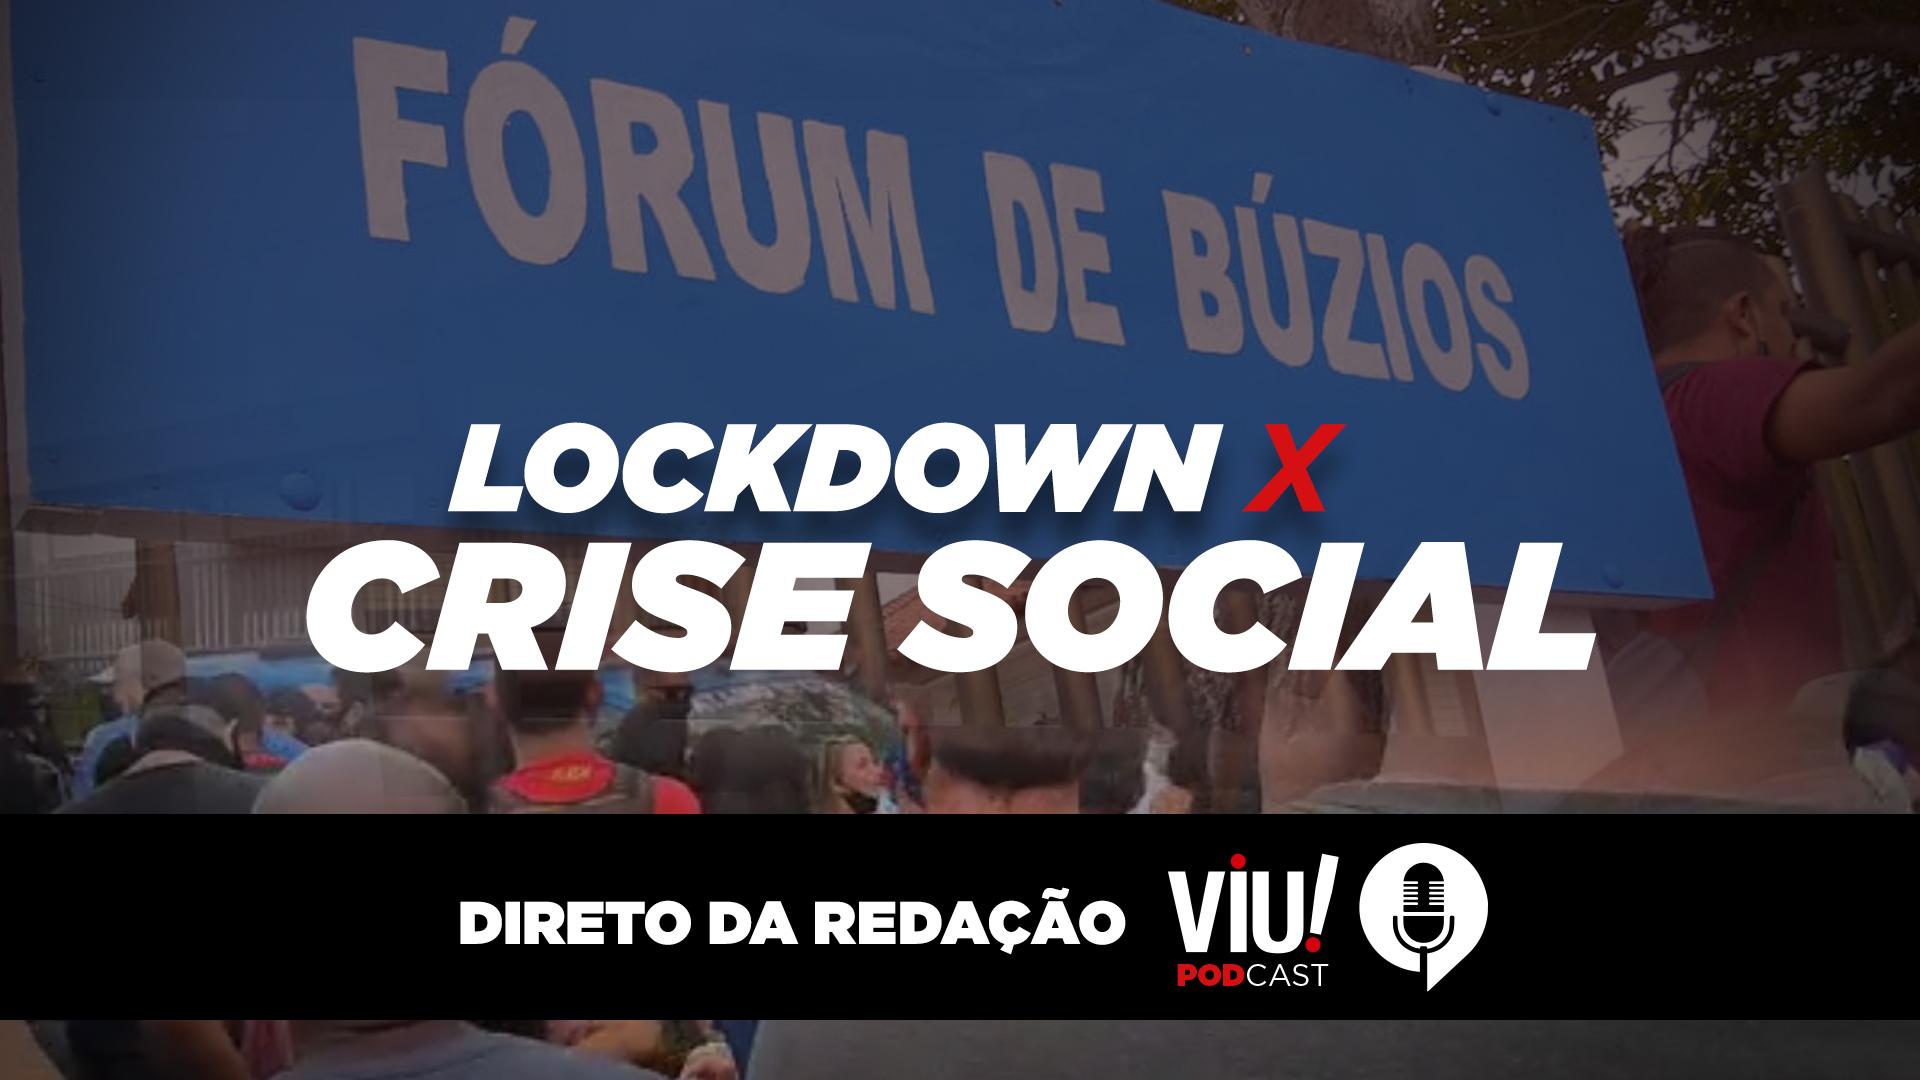 Lockdown x crise social